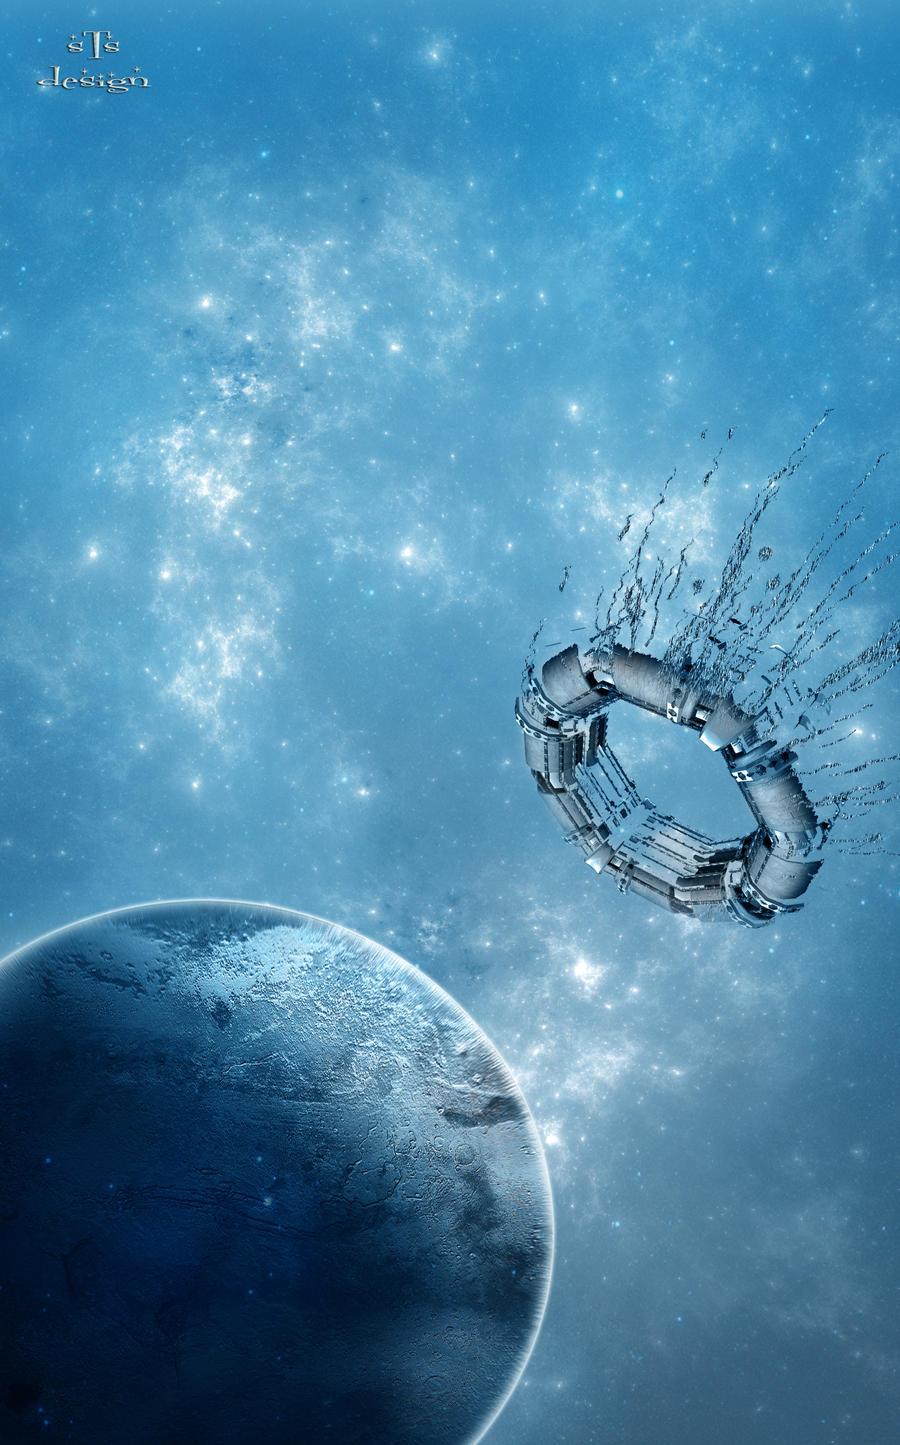 Dropping portal by StellaTheStarDesign